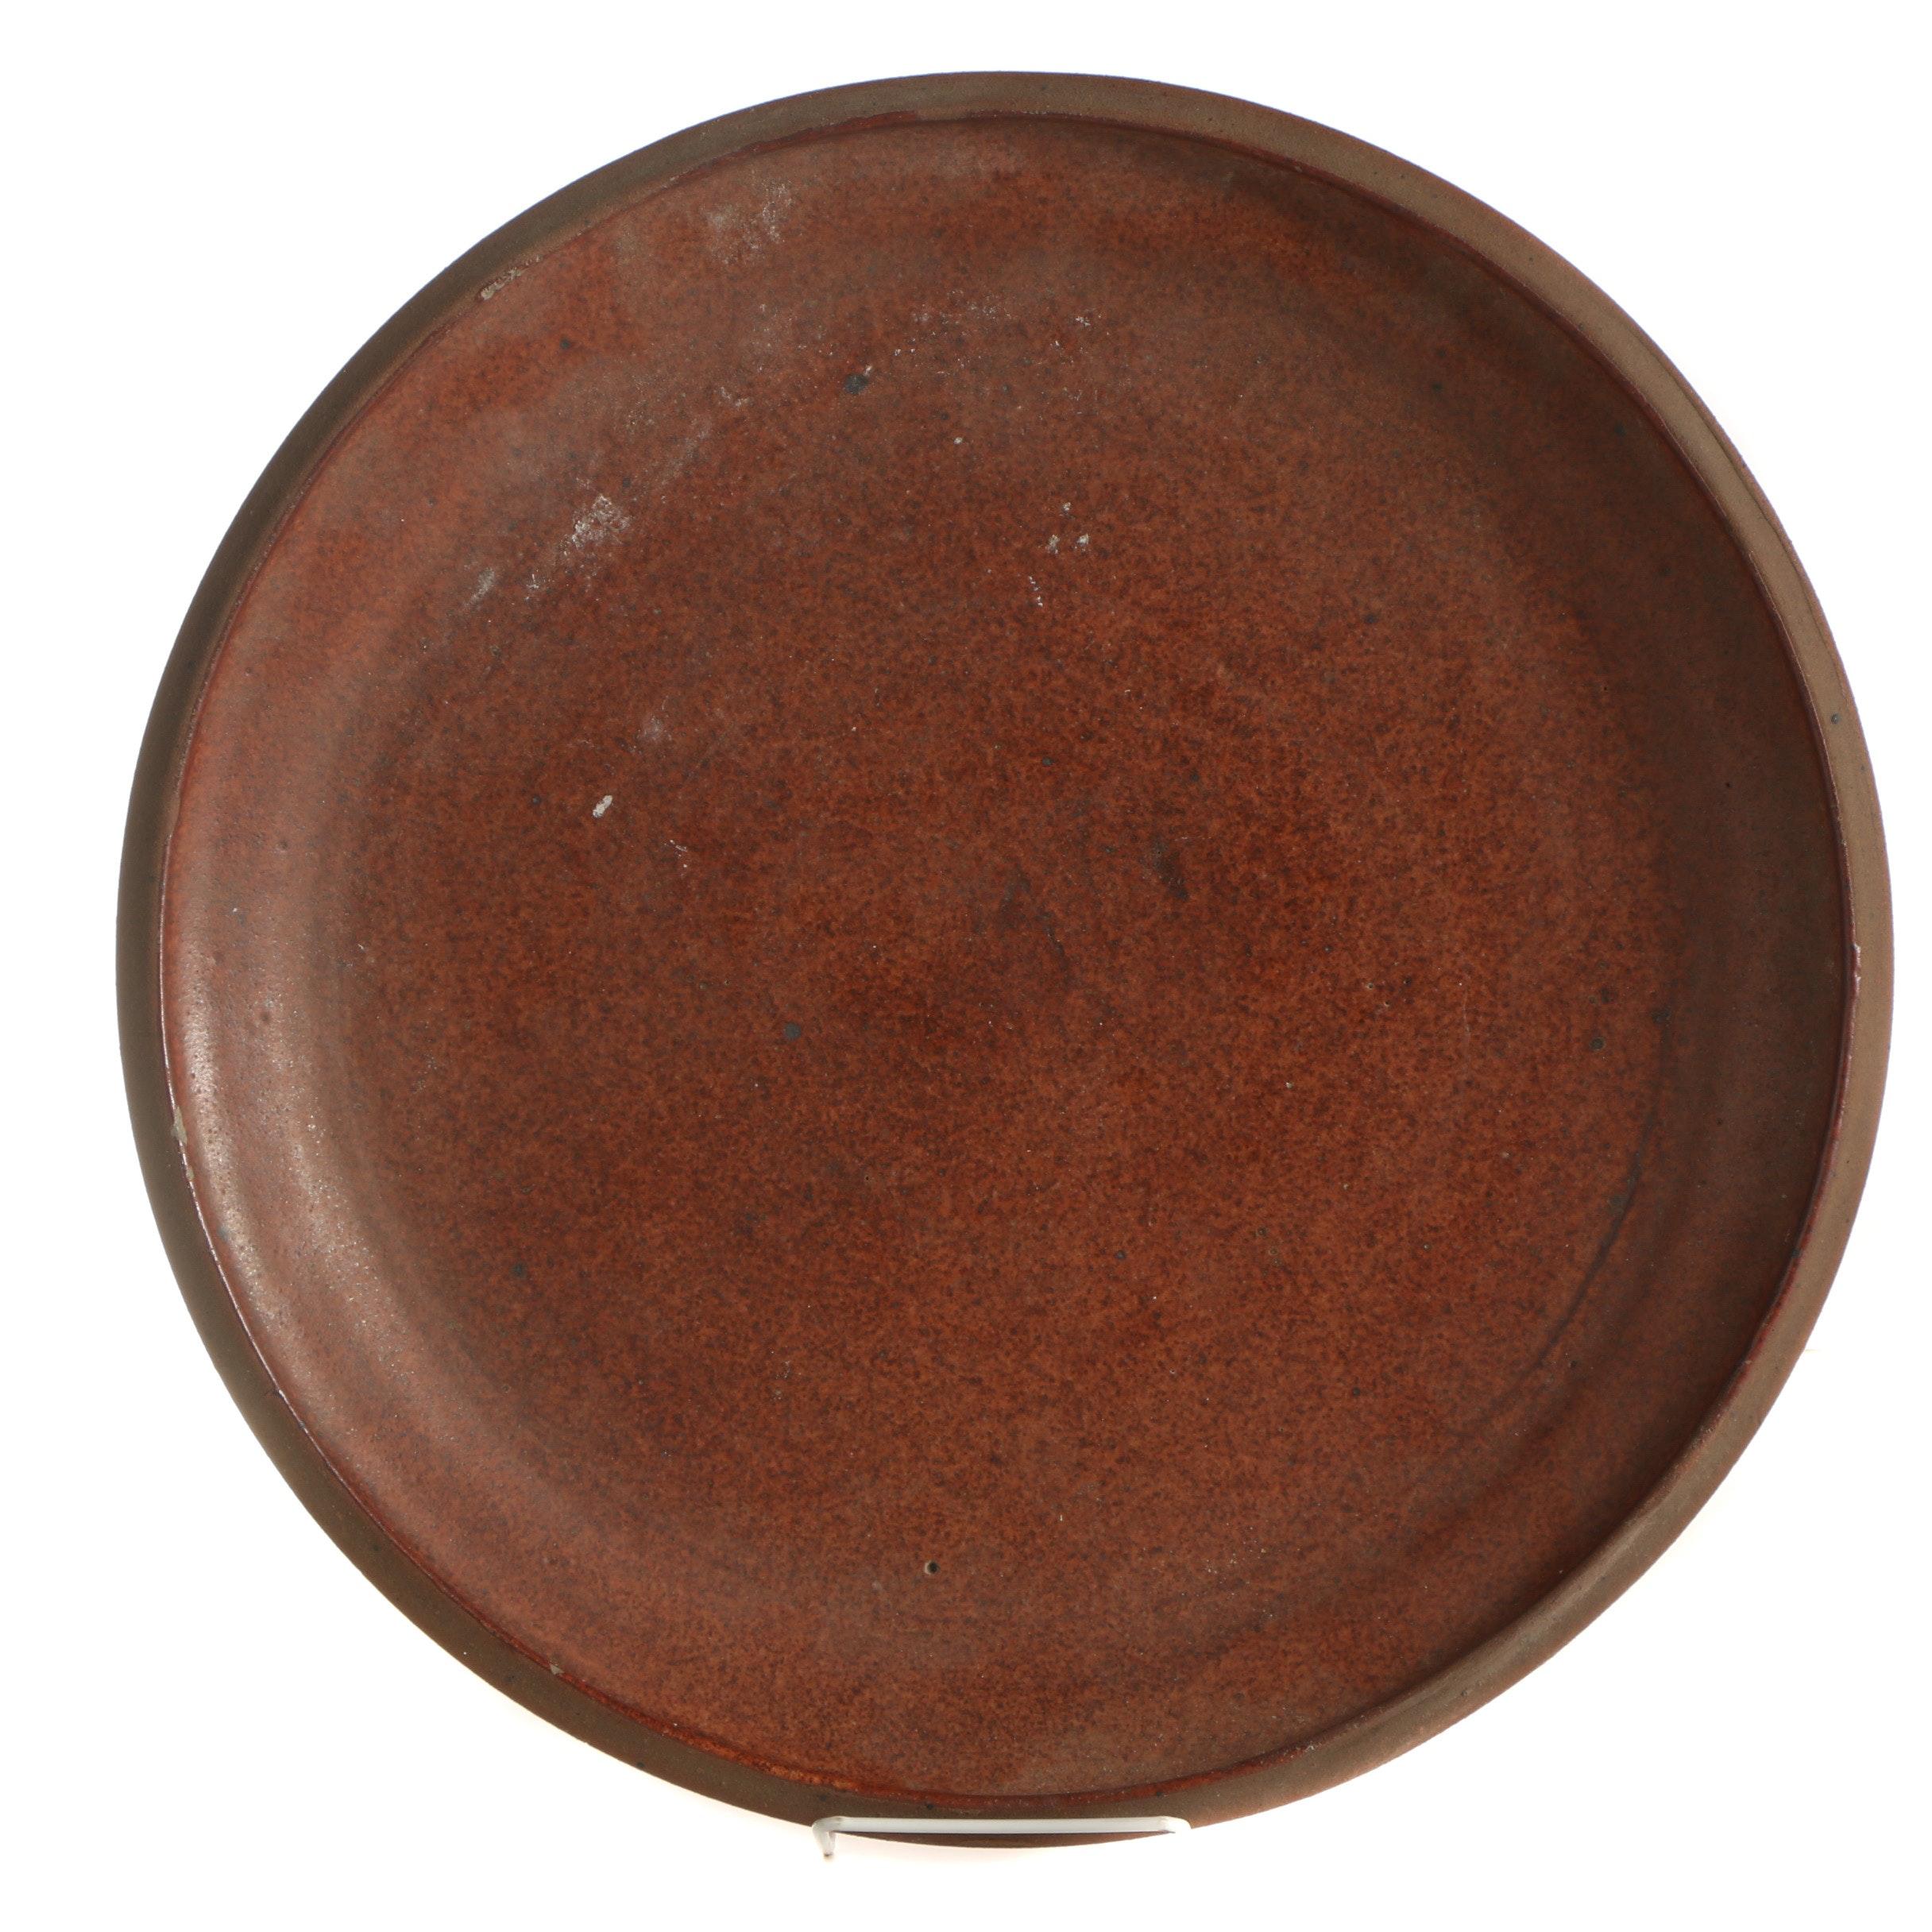 John Tuska Stoneware Plate